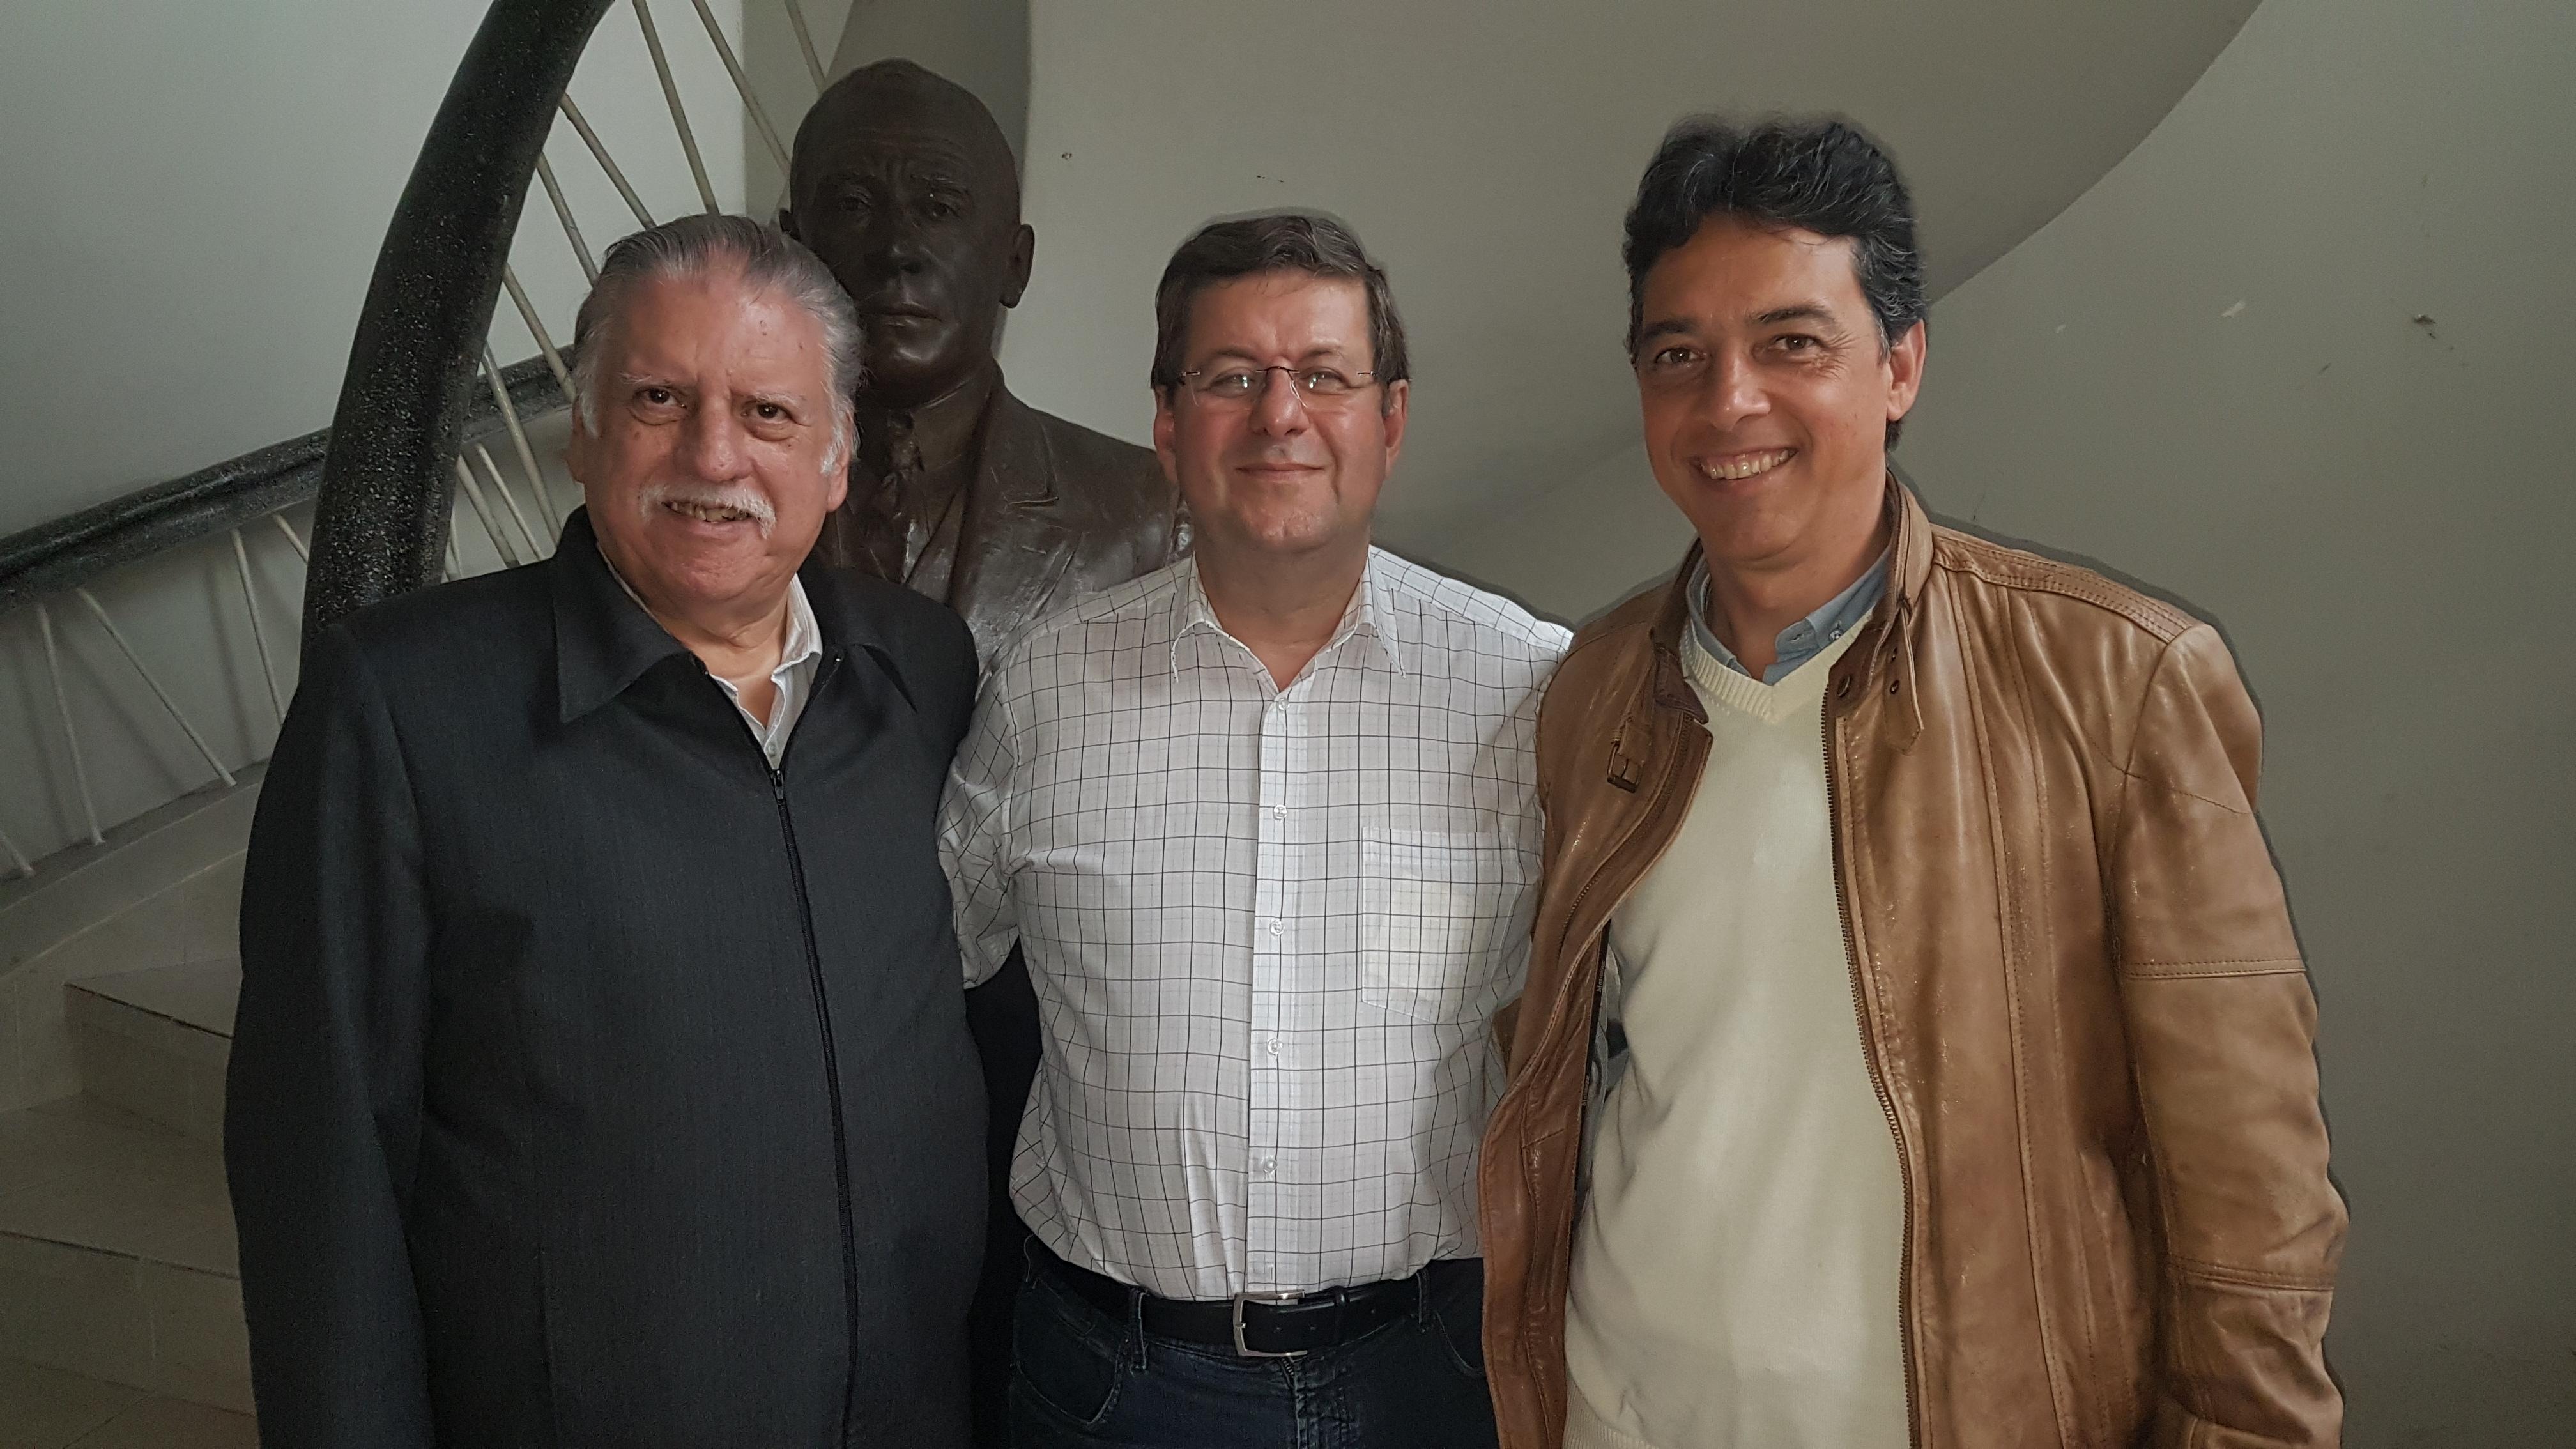 Presidente Ney Perracini de Azevedo, Jorge Cury Neto e Eduardo Manoel Araújo